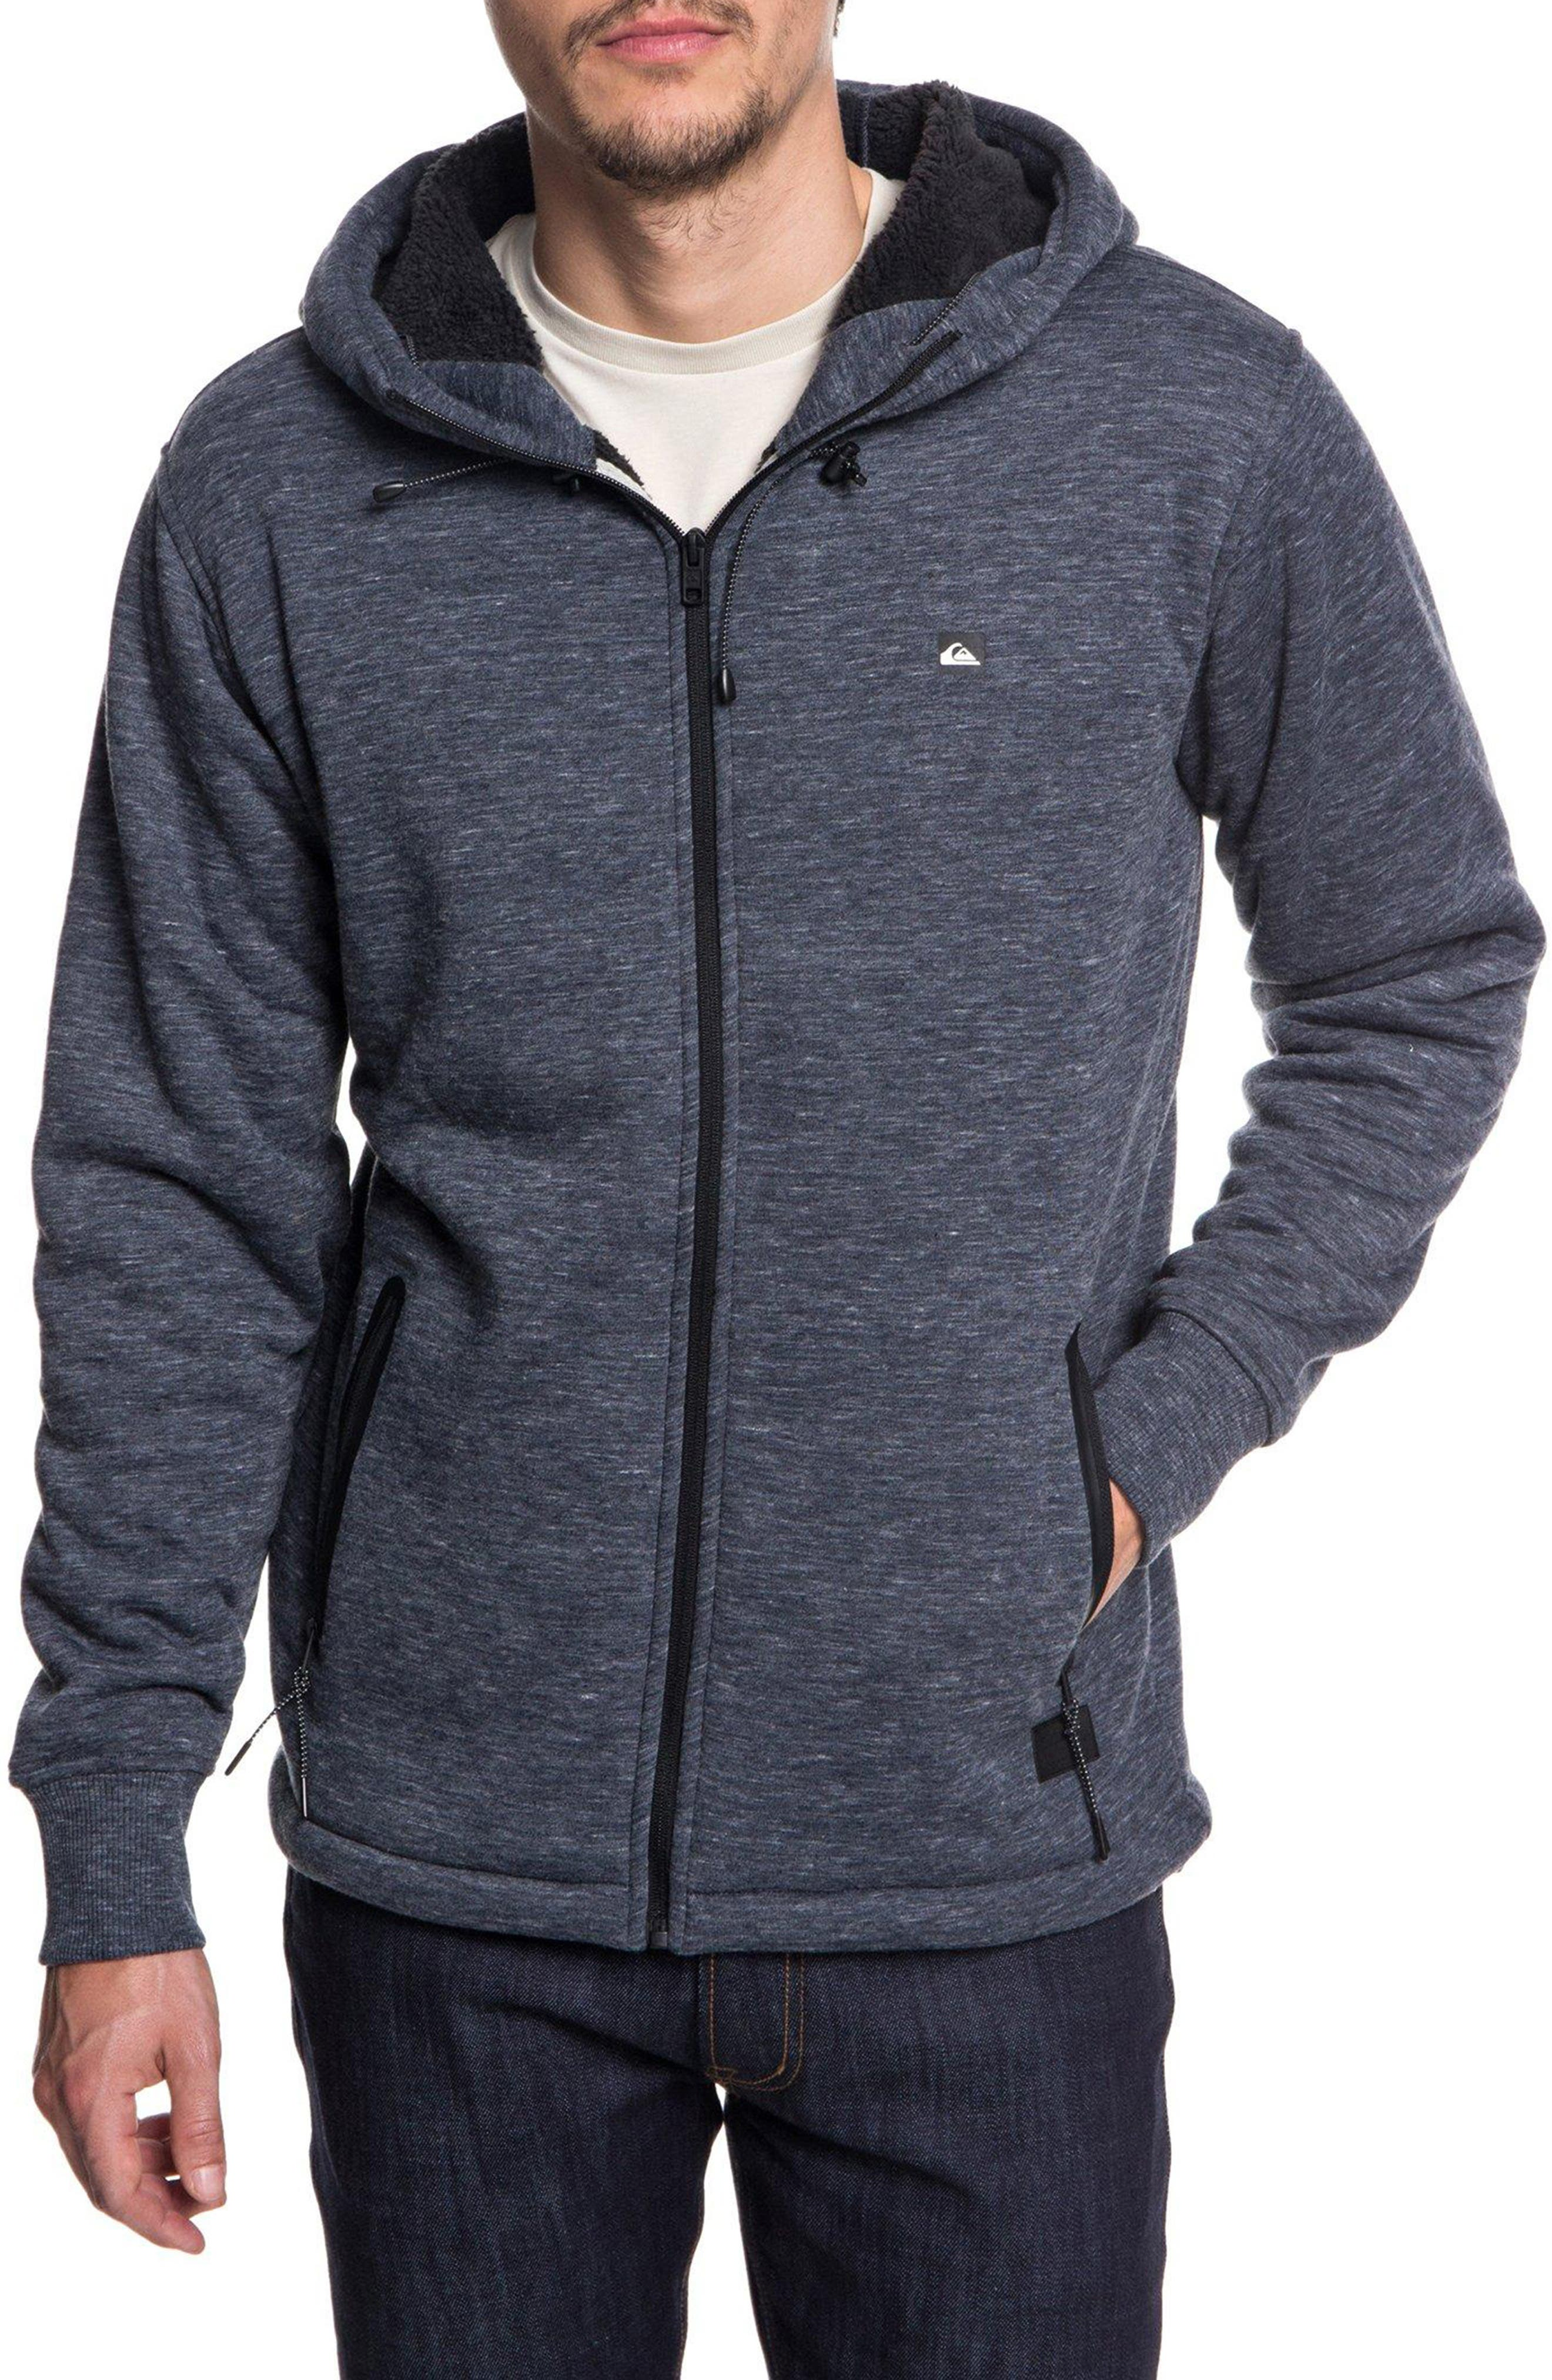 Kurow Fleece Hooded Jacket,                         Main,                         color, BLUE NIGHTS HEATHER